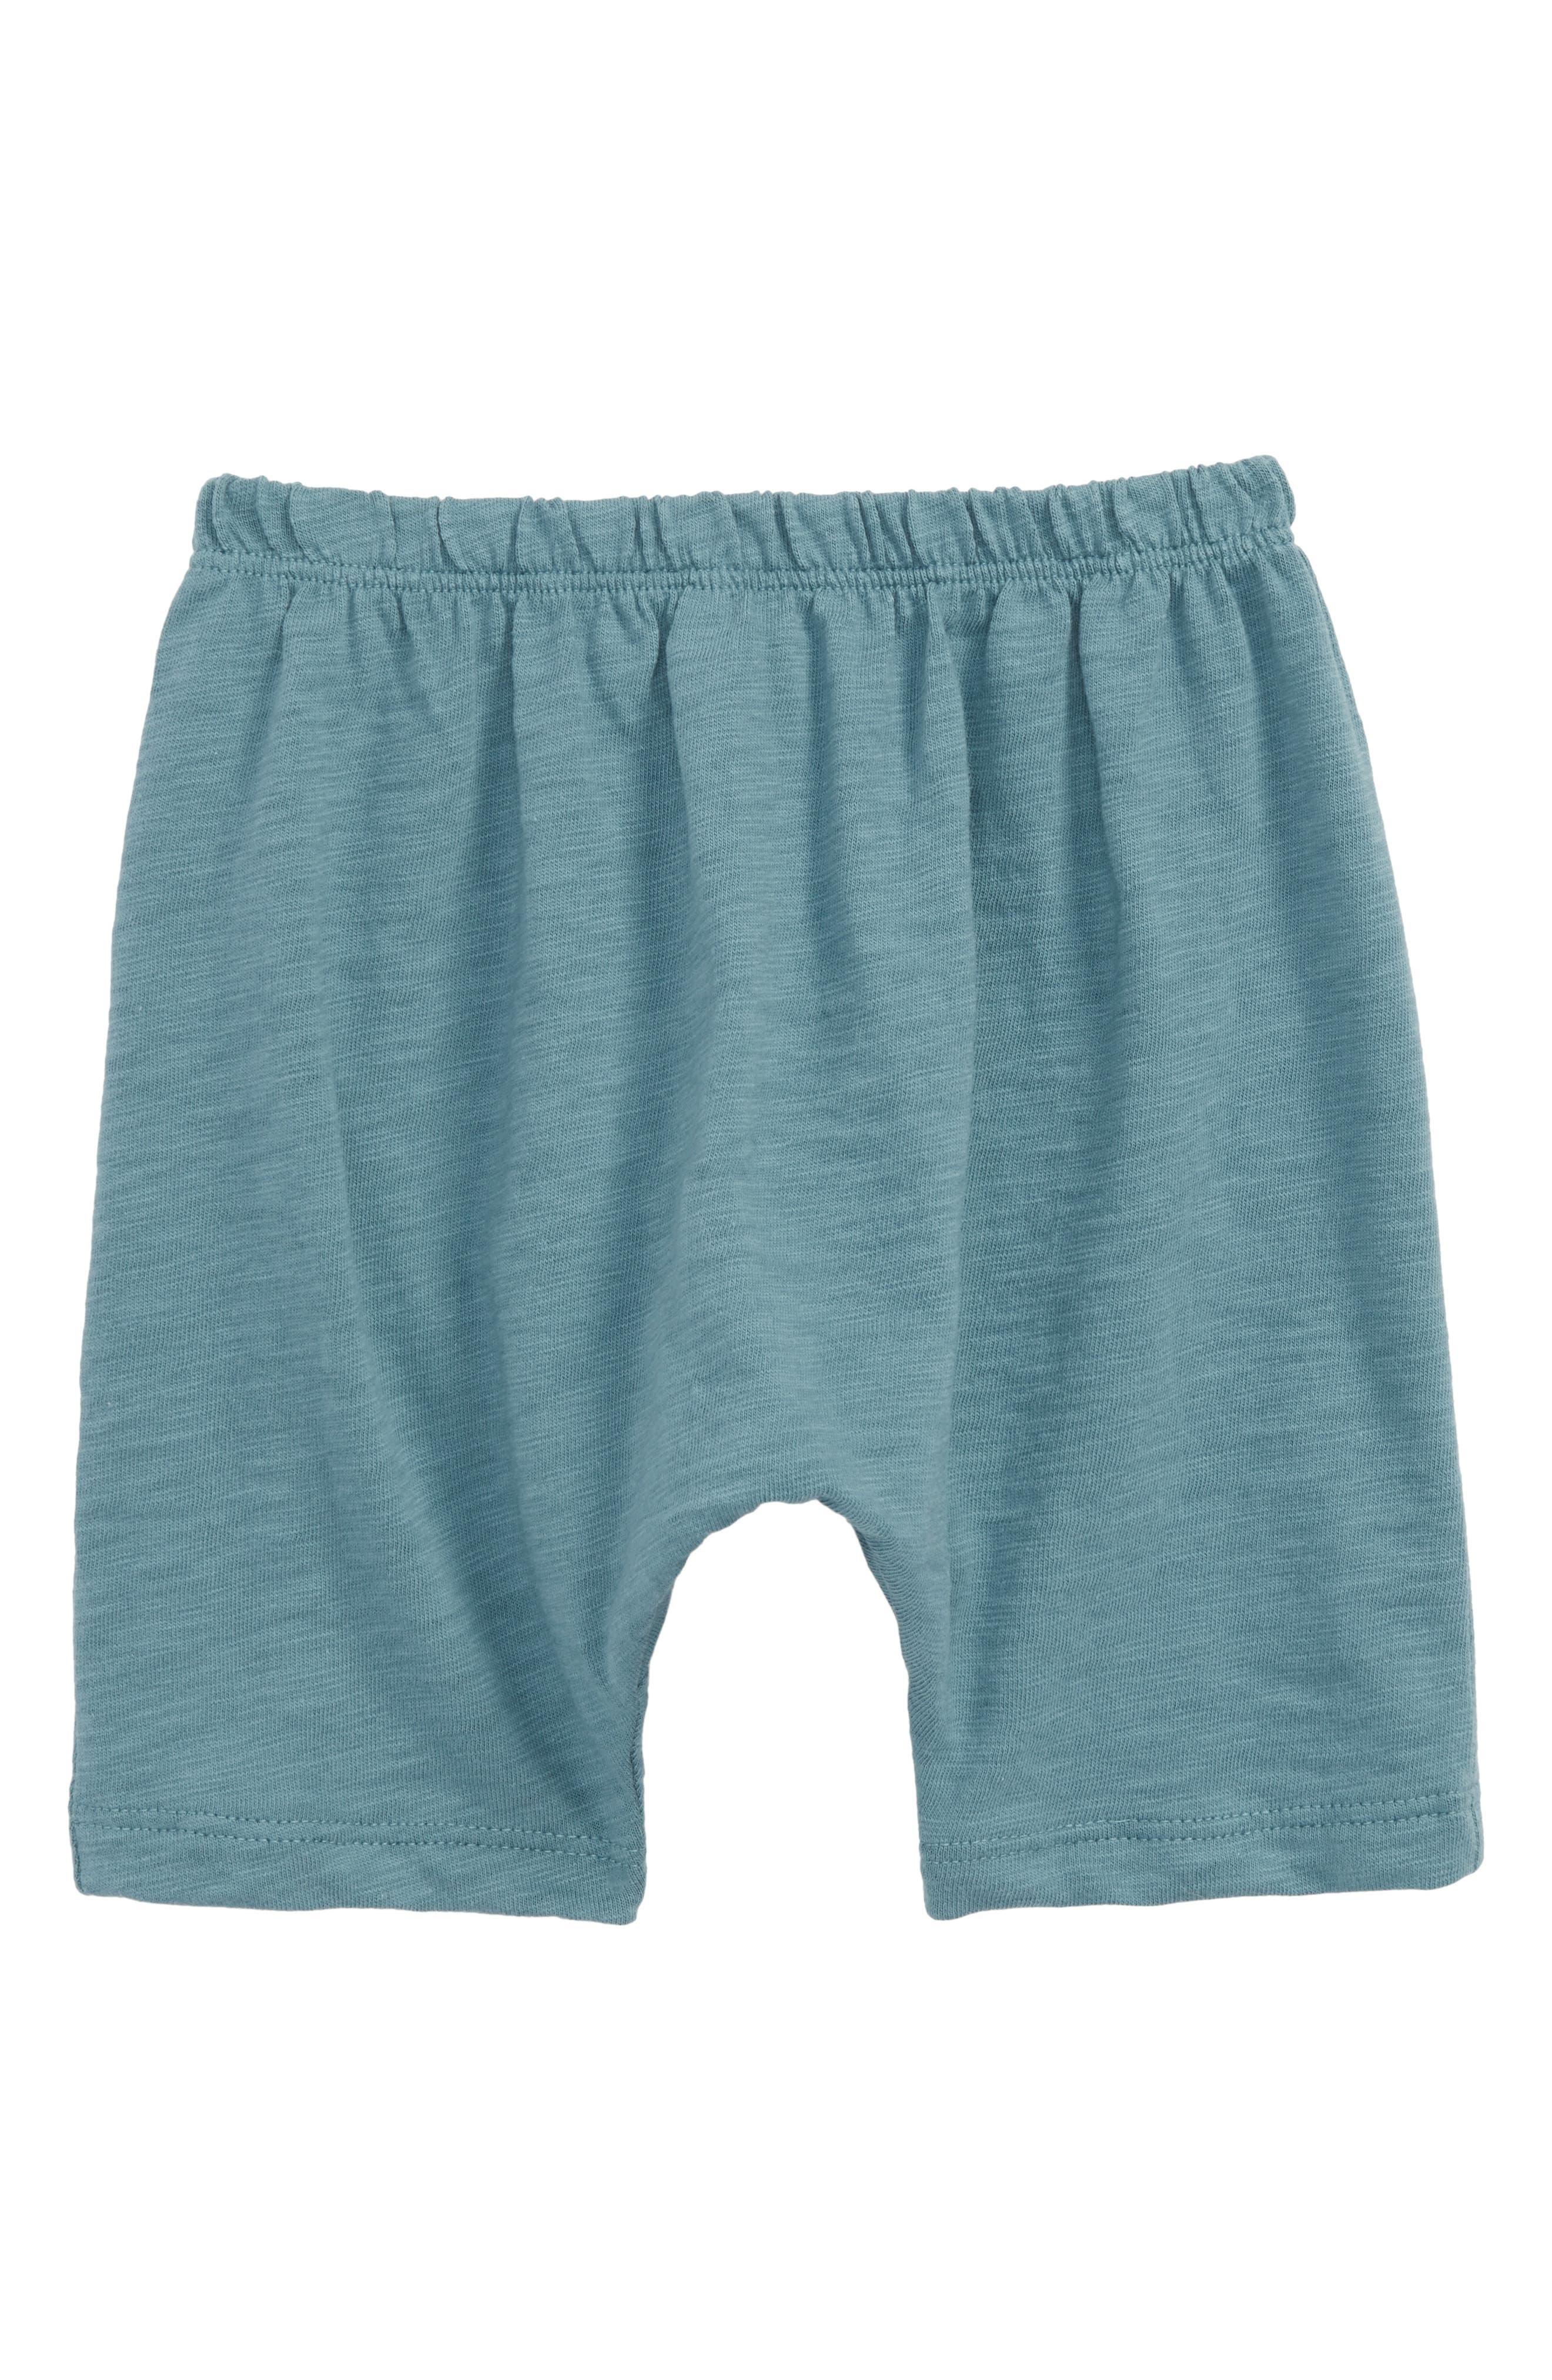 Peek Happy Shorts,                         Main,                         color, Blue